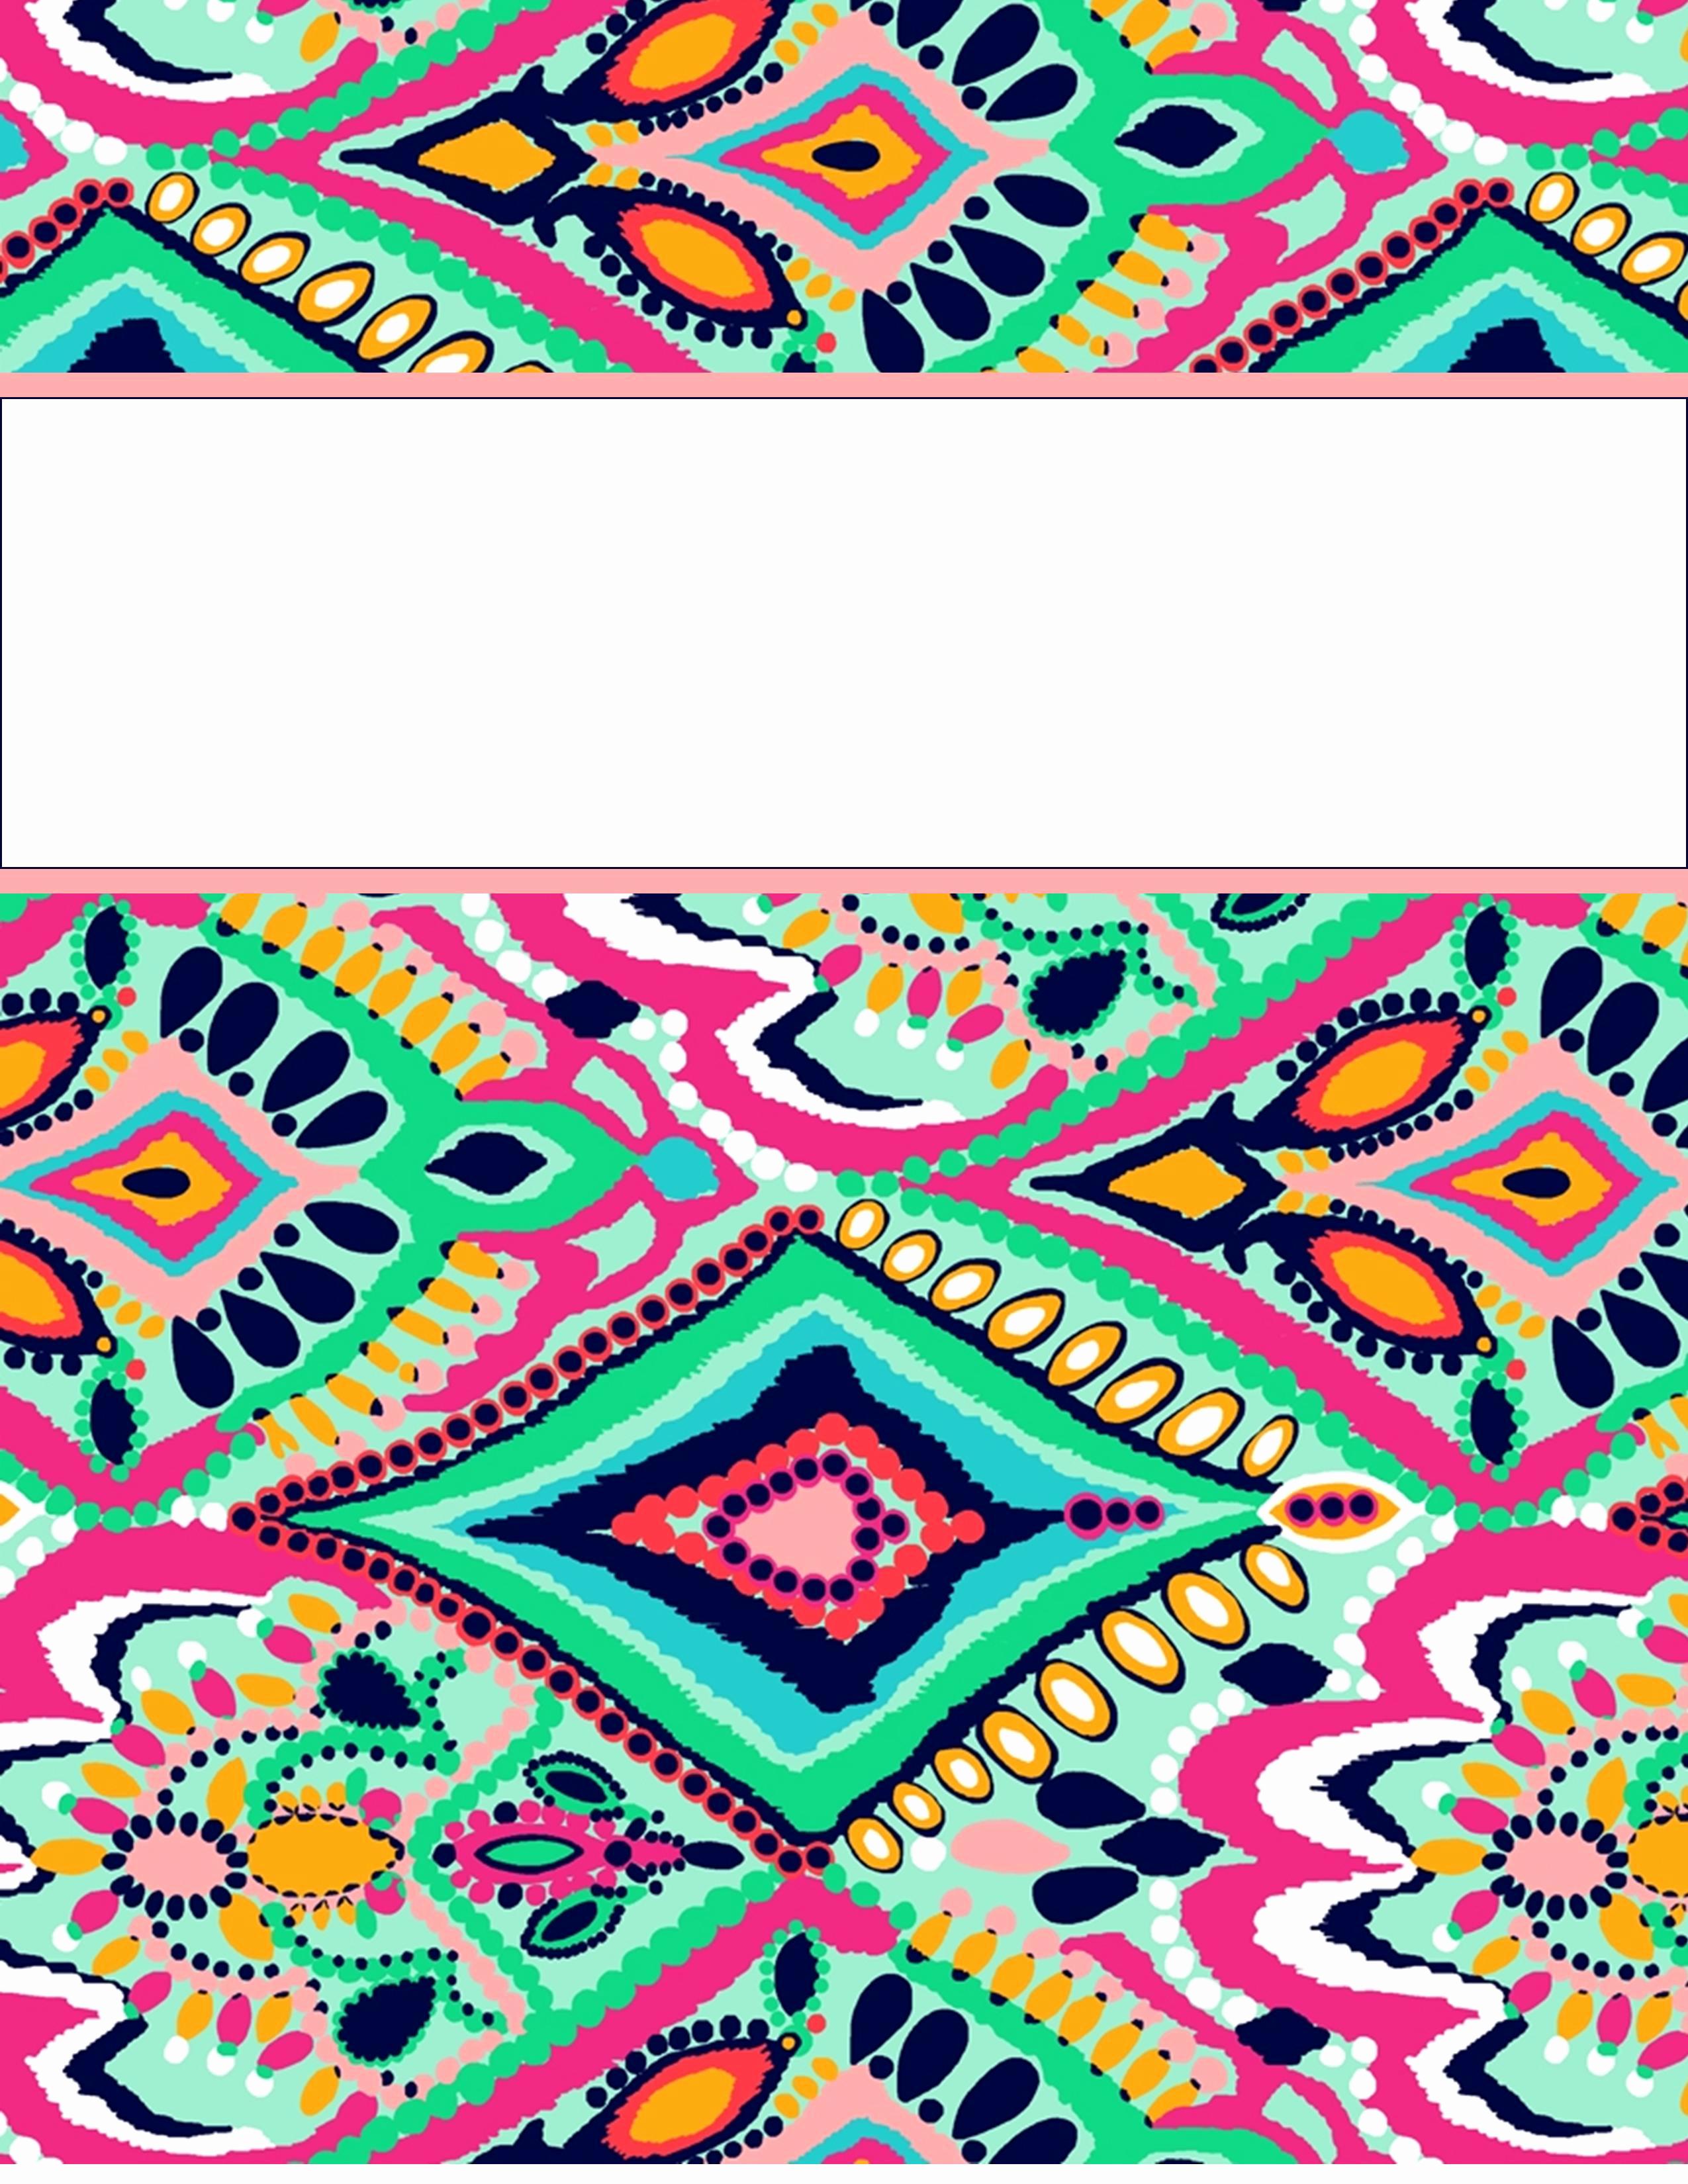 Free Editable Printable Binder Covers Lovely My Cute Binder Covers